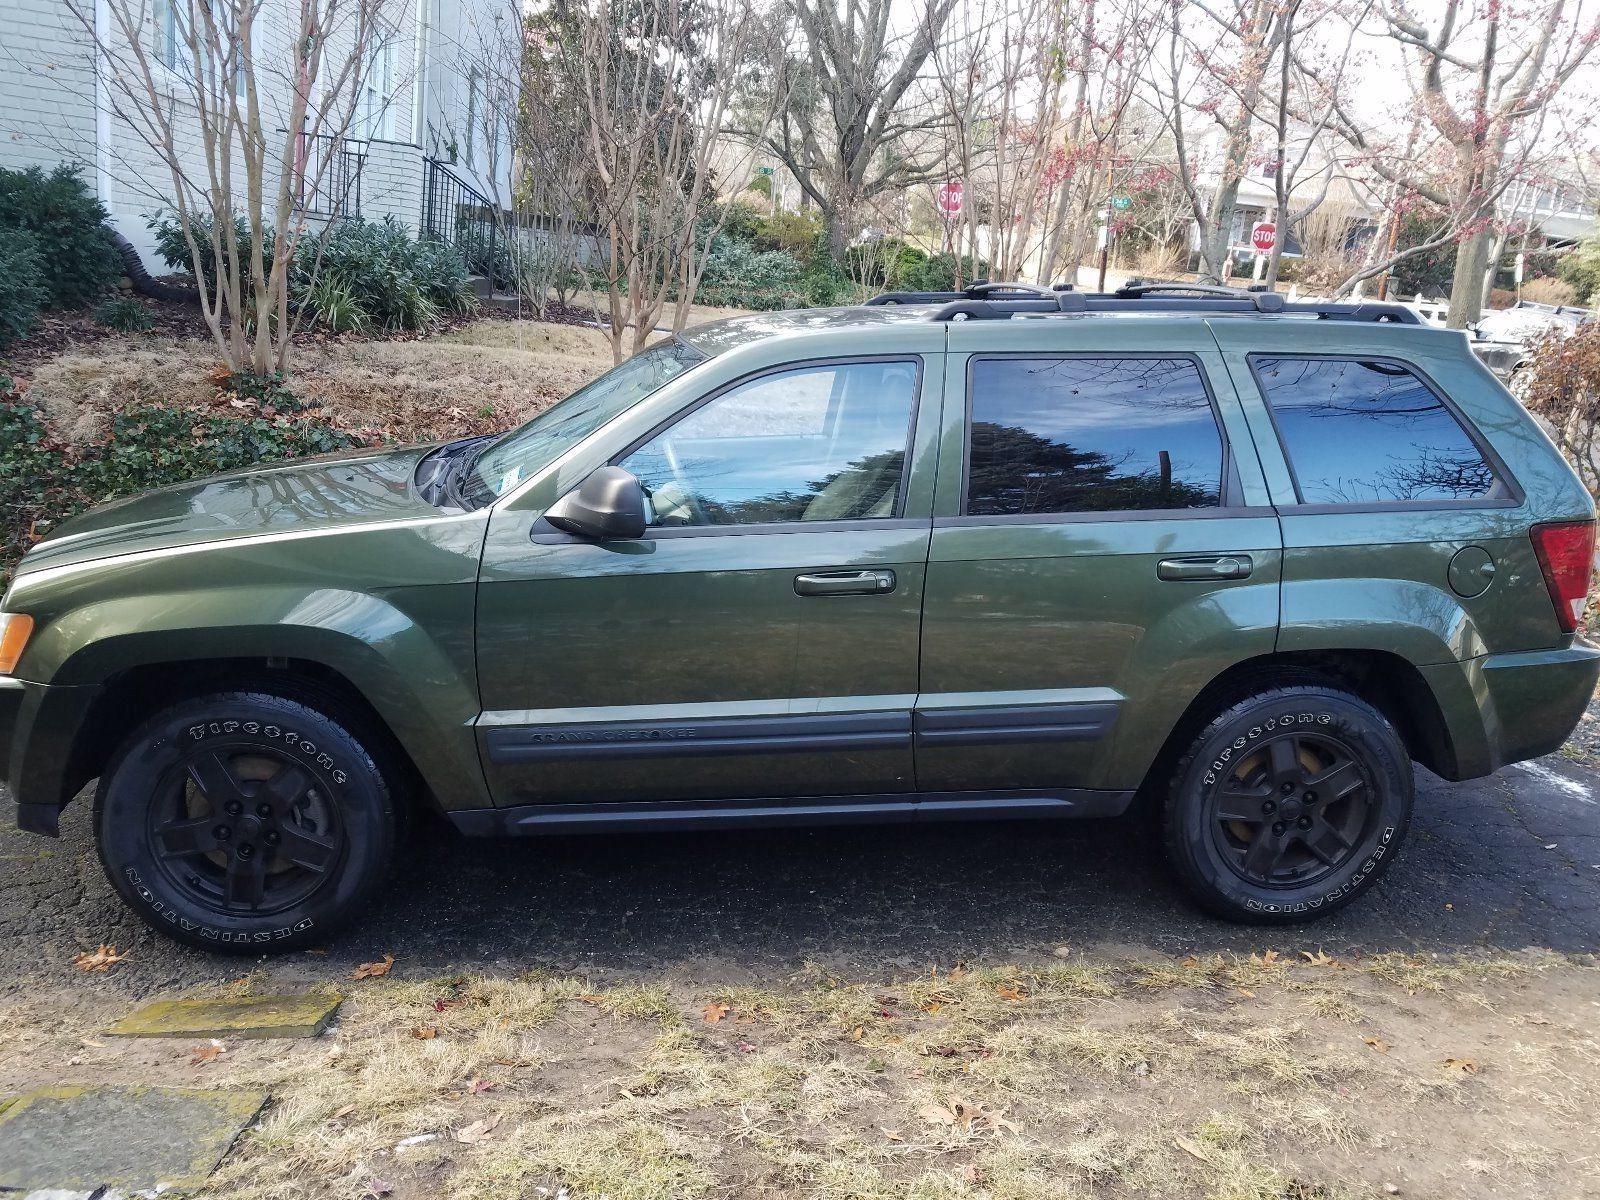 new rwd grand inventory jeep sport cherokee auto laredo utility freeland